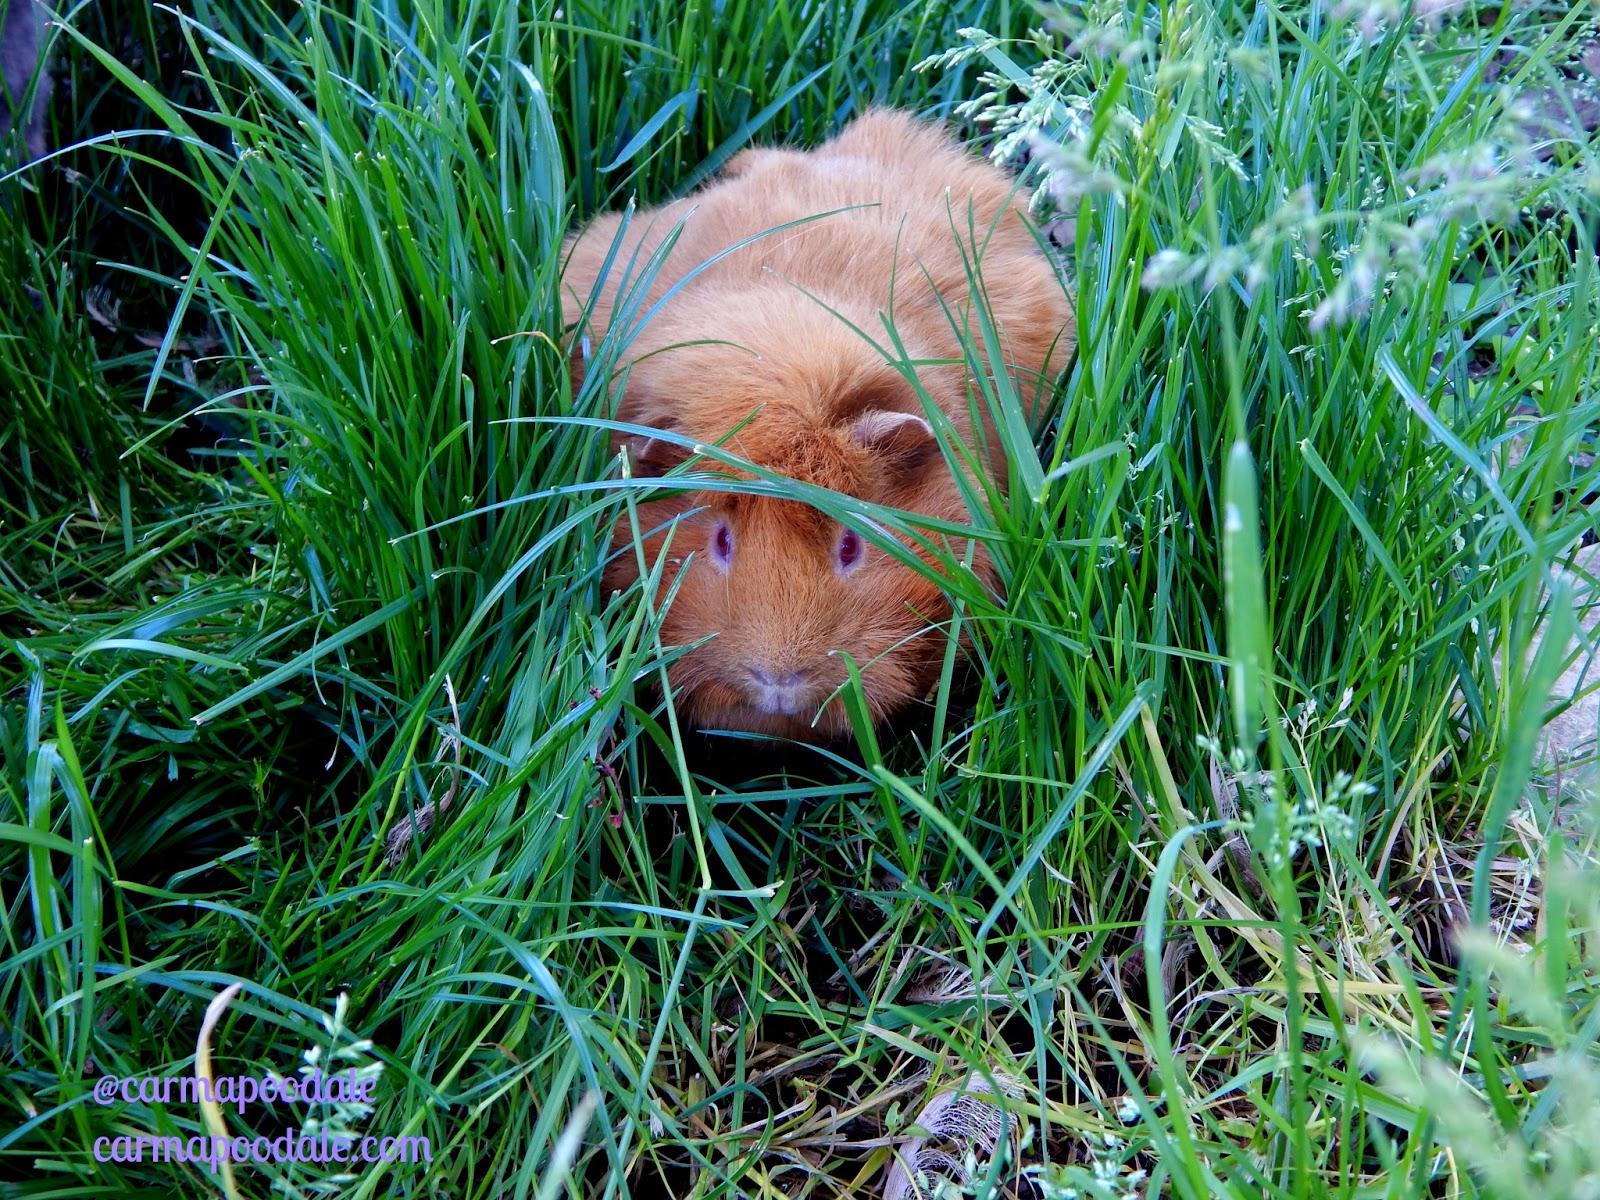 Guinea pig nibbling grass